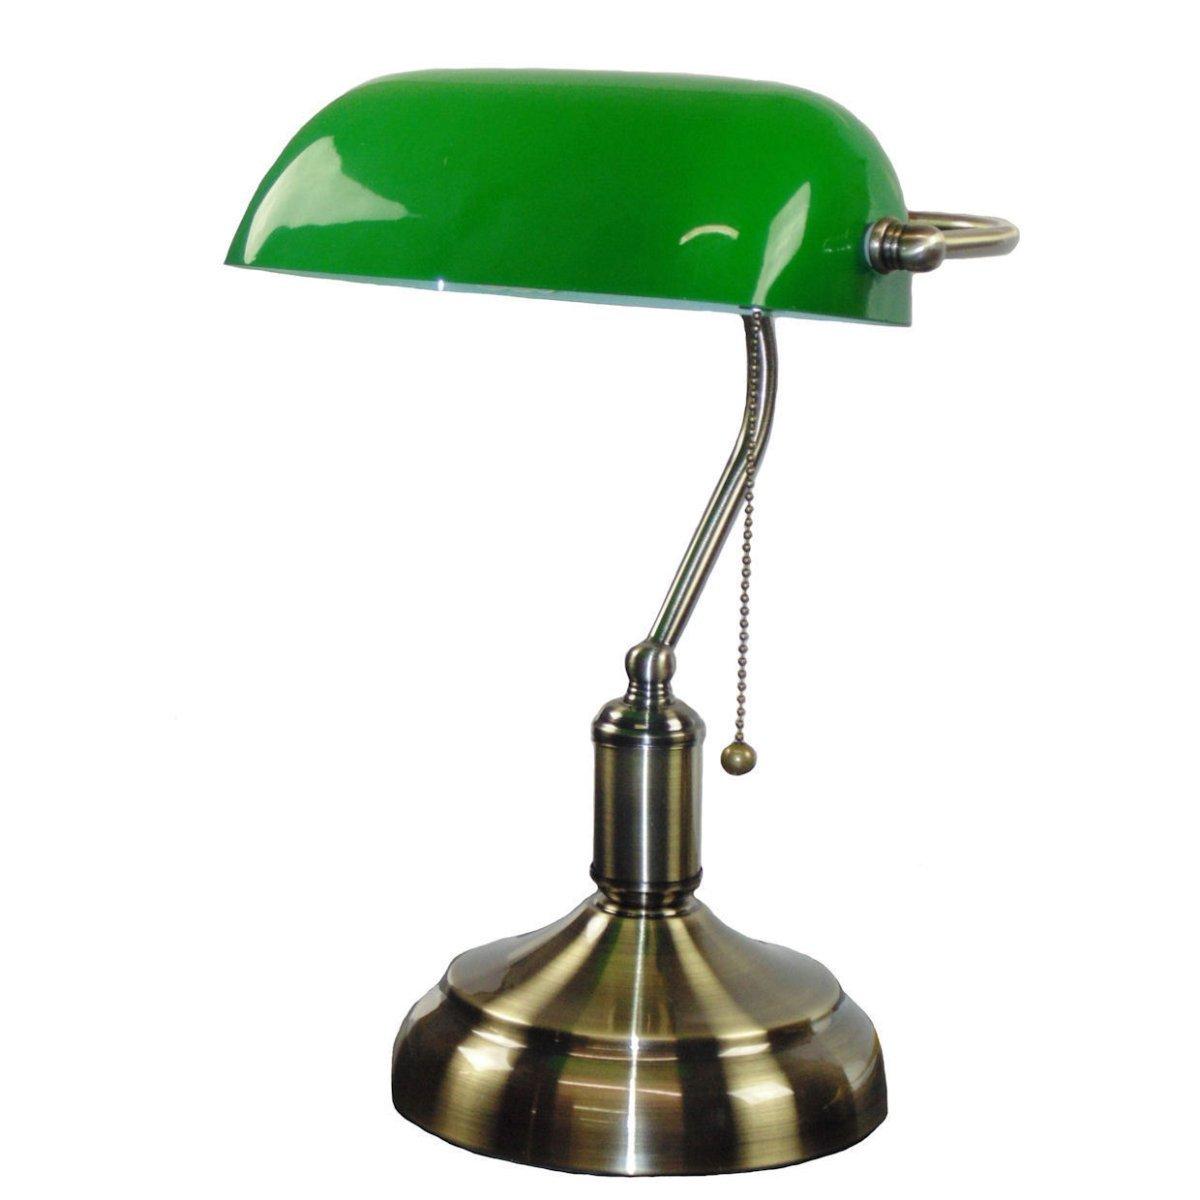 Get Quotations · JT Lighting 3101 Bankers Desk Lamp Green Glass Shade  Antique Design44; Gold - Madison Bronze - Cheap Antique Bankers Desk Lamp, Find Antique Bankers Desk Lamp